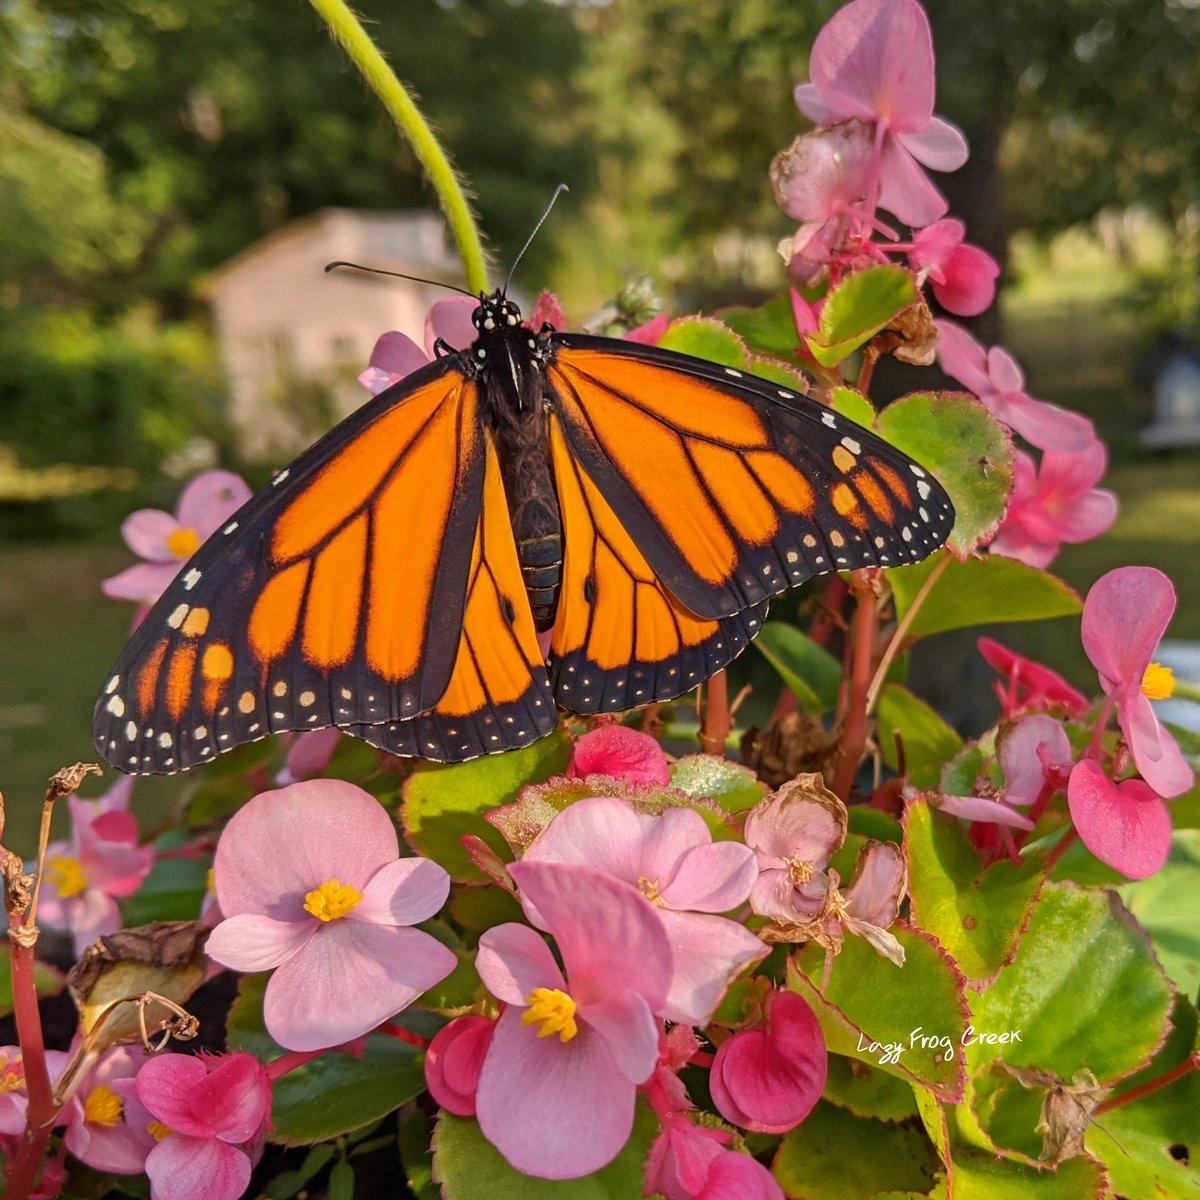 #monarch #butterfly #MondayMotivation #naba #nature #wildlife  #NewJersey https://t.co/bnUXP1Sjtt